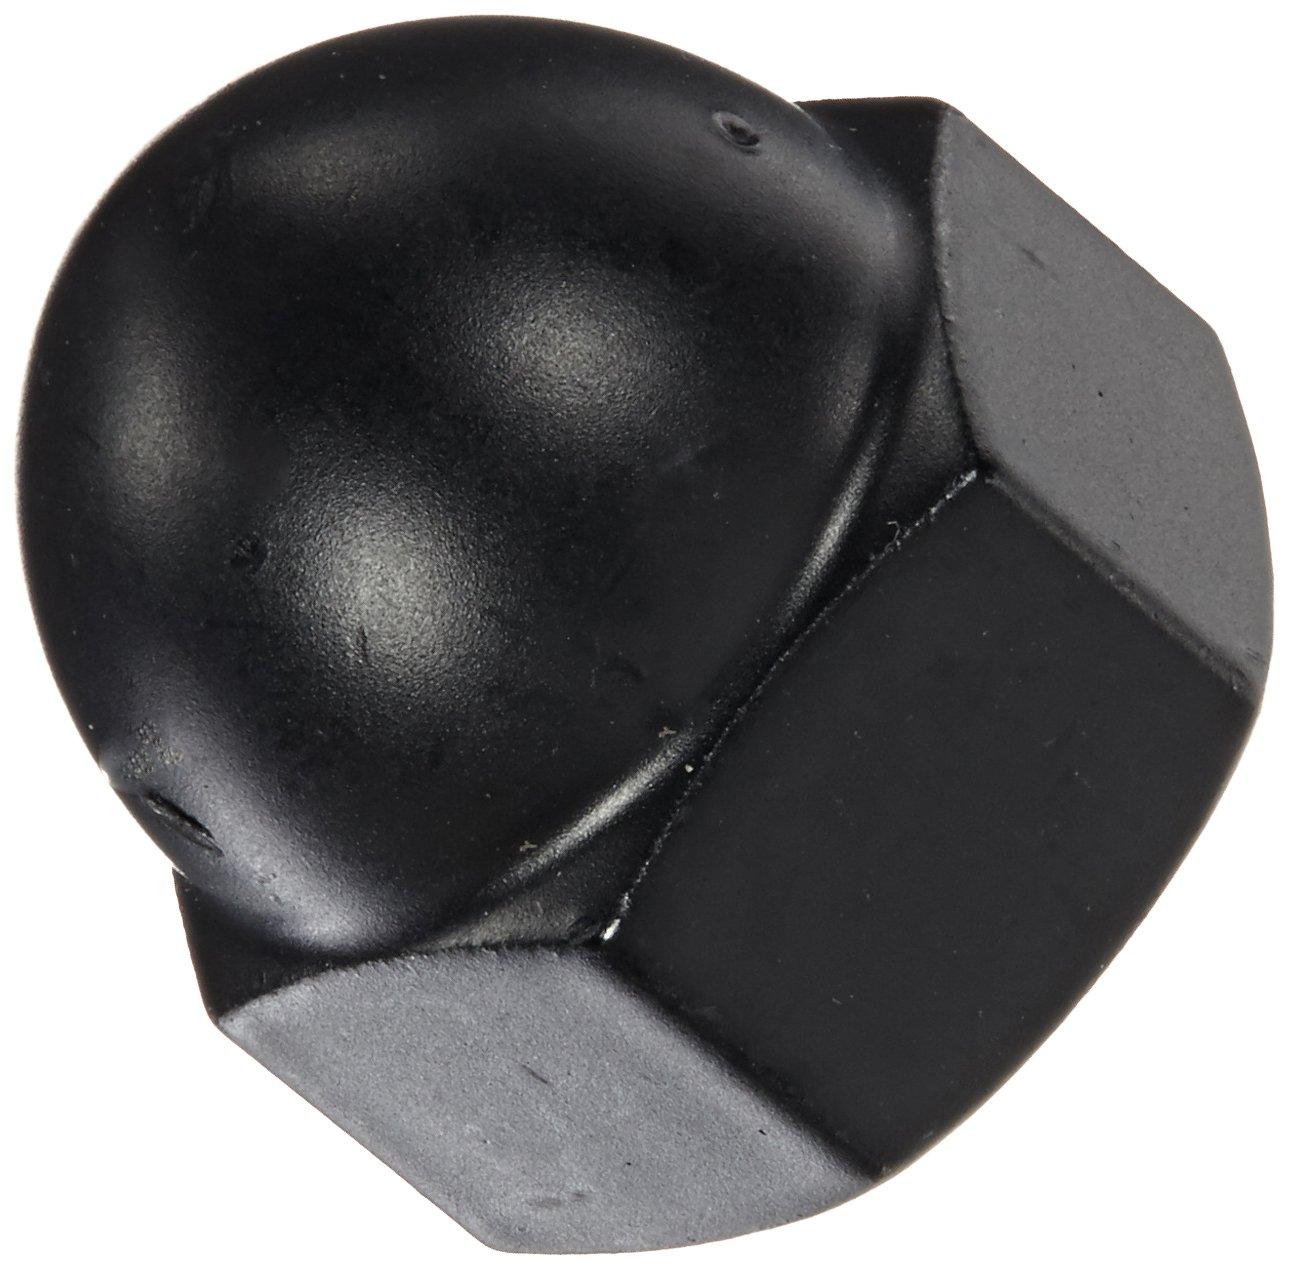 Pack of 5 Black Powder-Coated Steel Acorn Nut 5//16-18 Thread Size 1//2 Width Across Flats 17//32 Height USA Made 5//16 Minimum Thread Depth